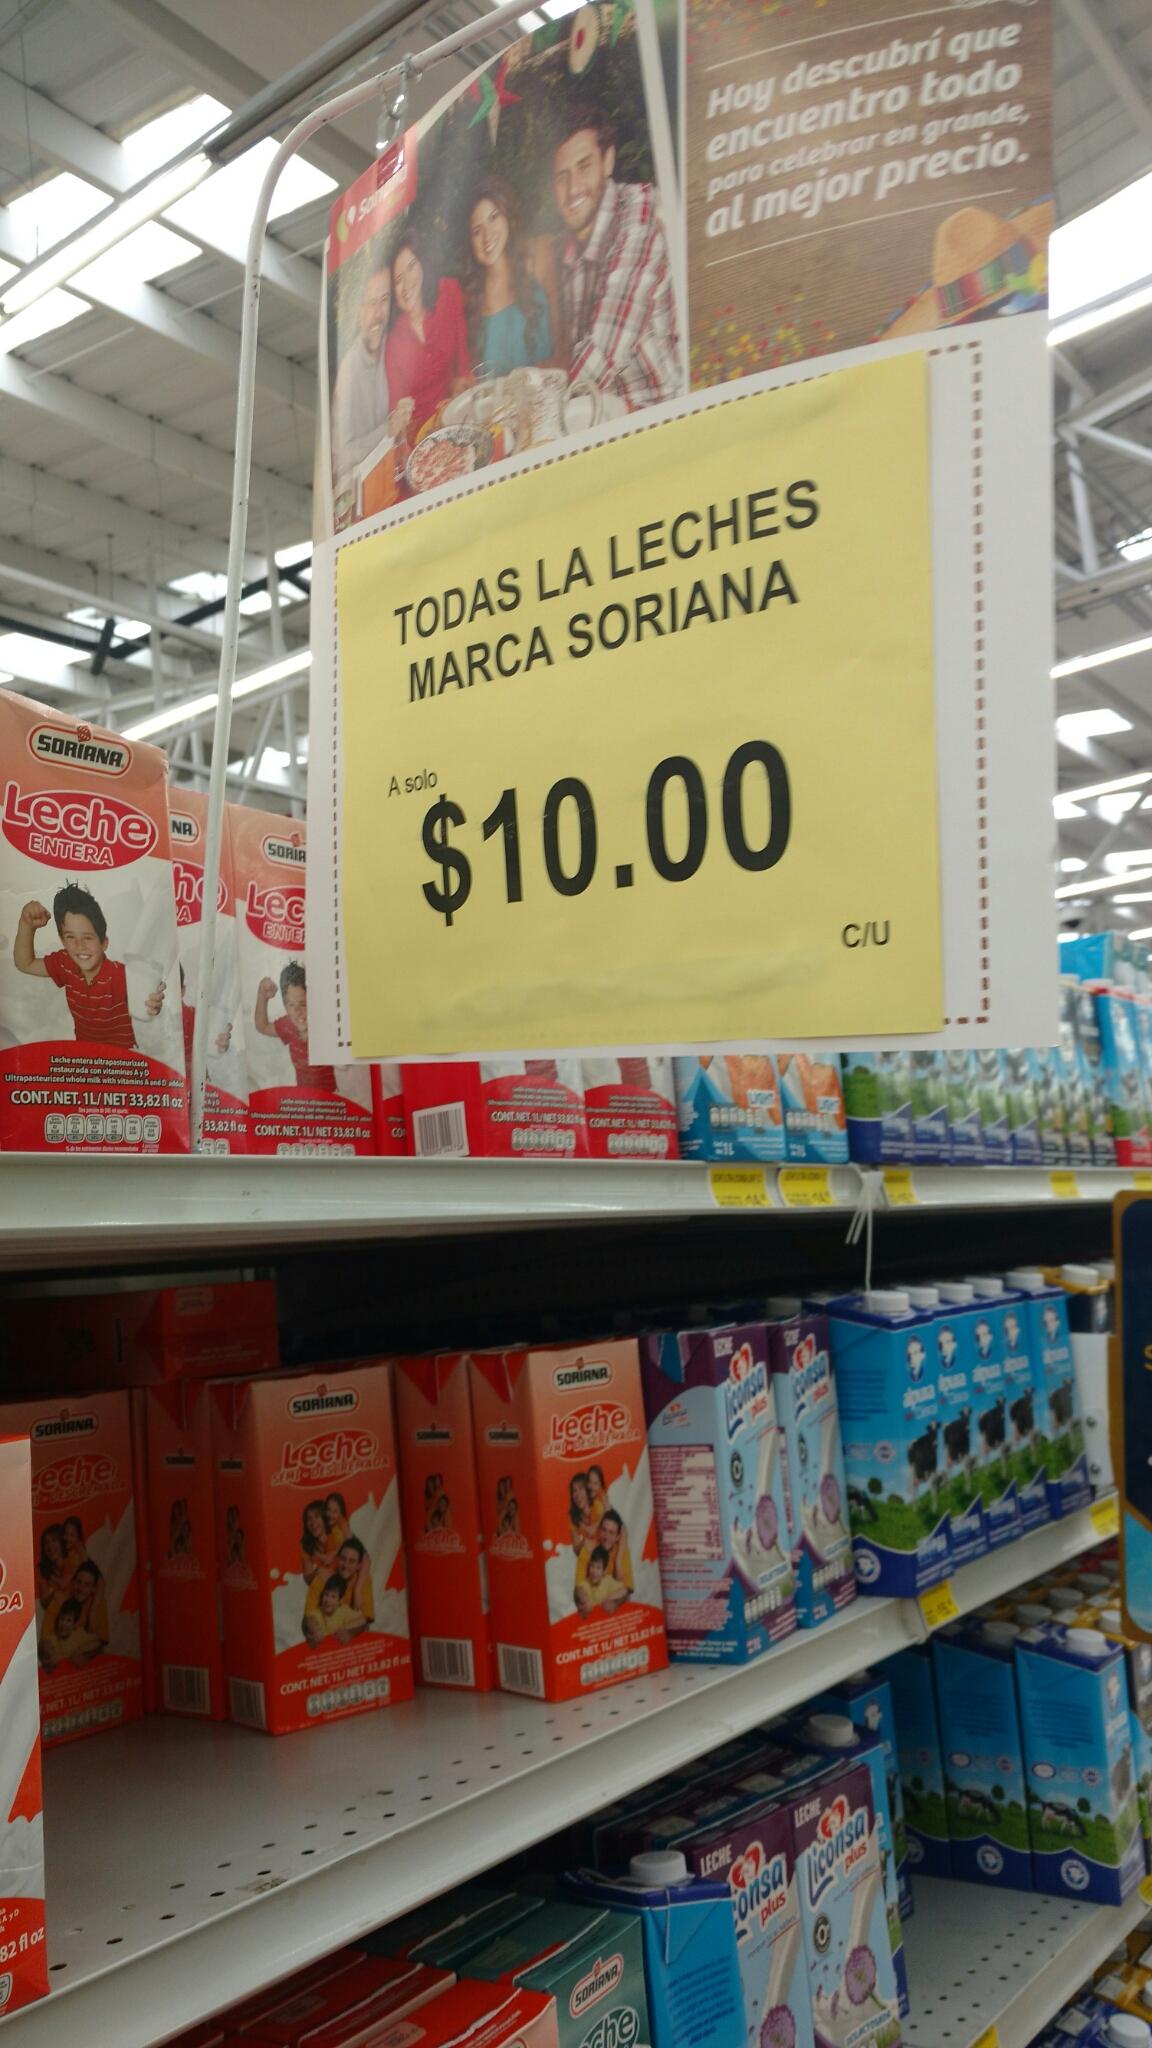 Todas las leches marca Soriana de 1Lt a $10